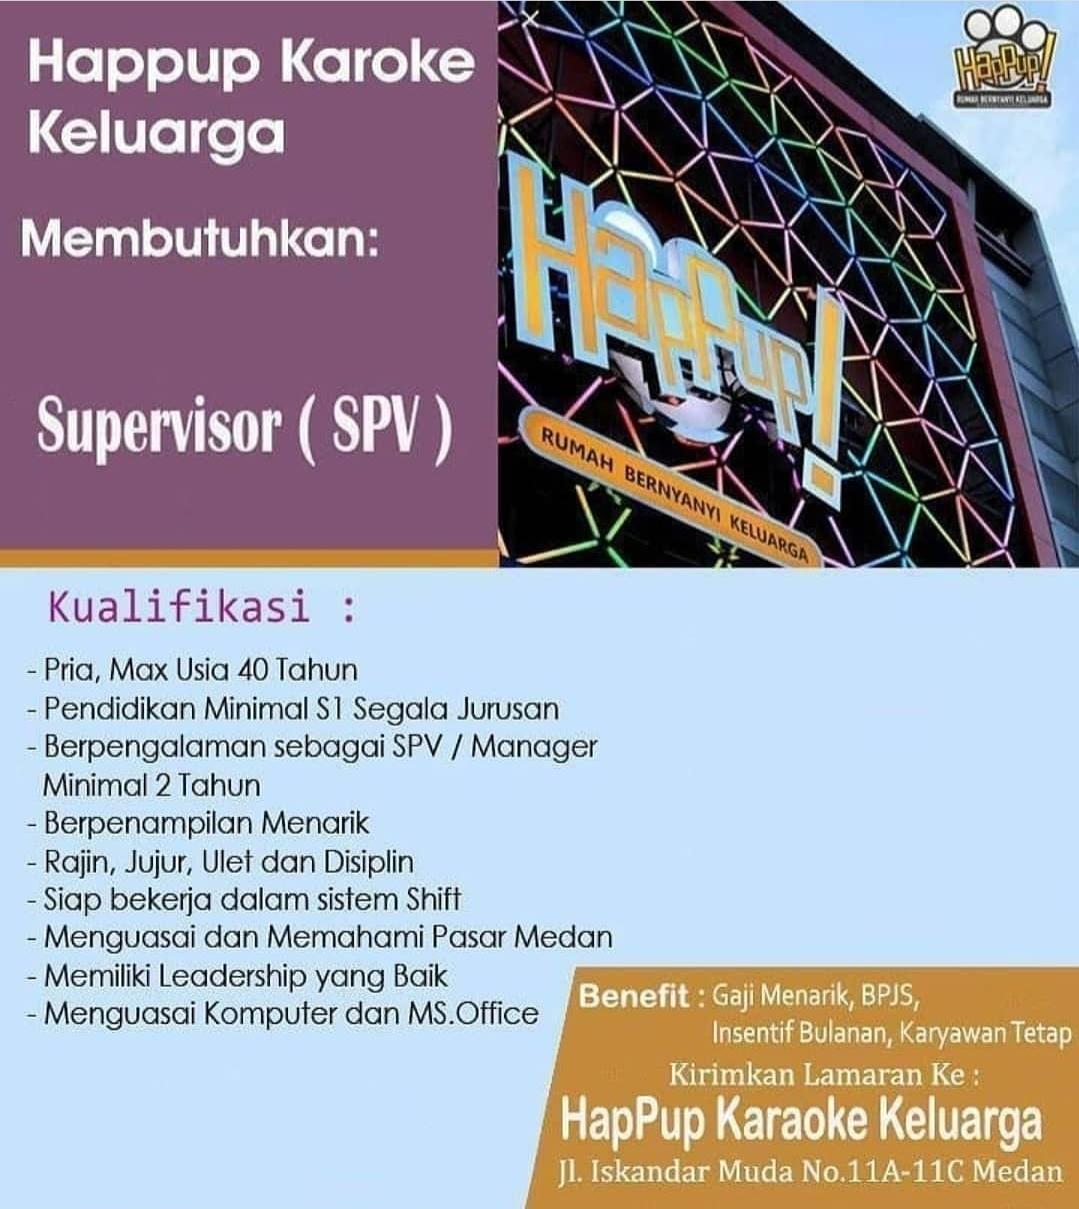 Lowongan Kerja S1 Segala Jurusan Di Happup Karaoke Keluarga Medan November 2020 Lowongan Kerja Medan Terbaru Tahun 2021